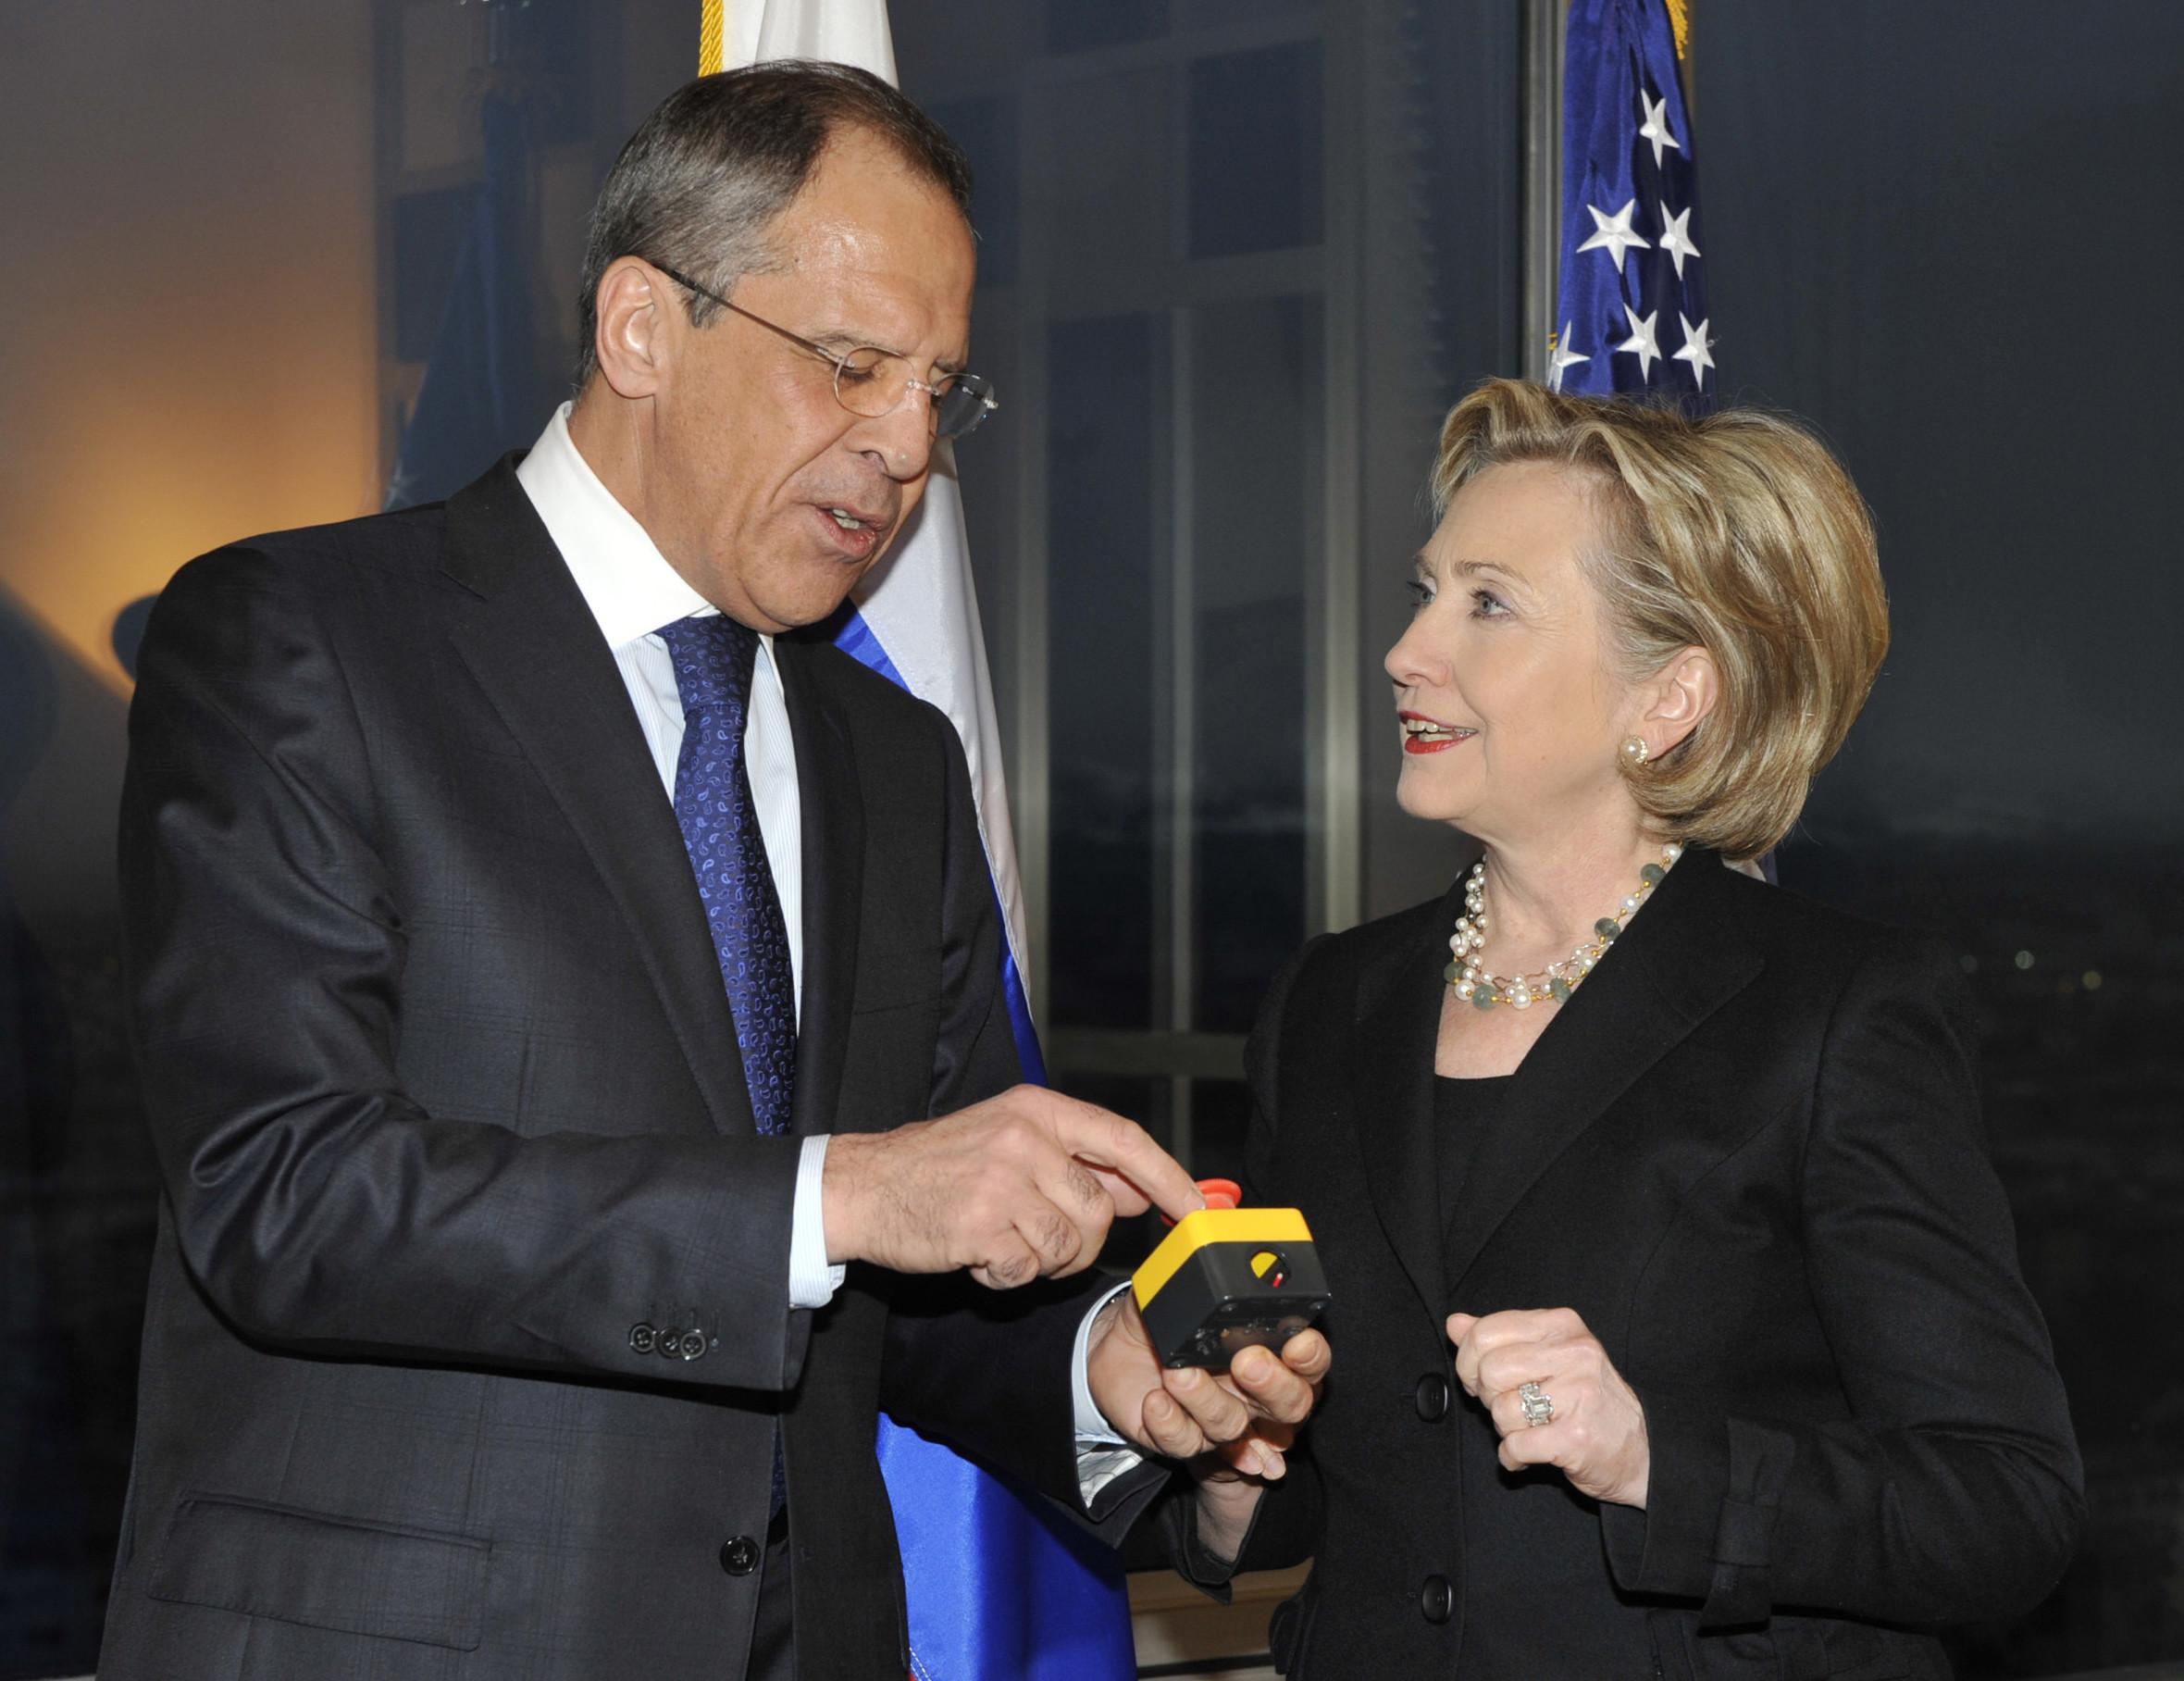 <p>Сергей Лавров и Хиллари Клинтон. Фото: © AP Photo</p>